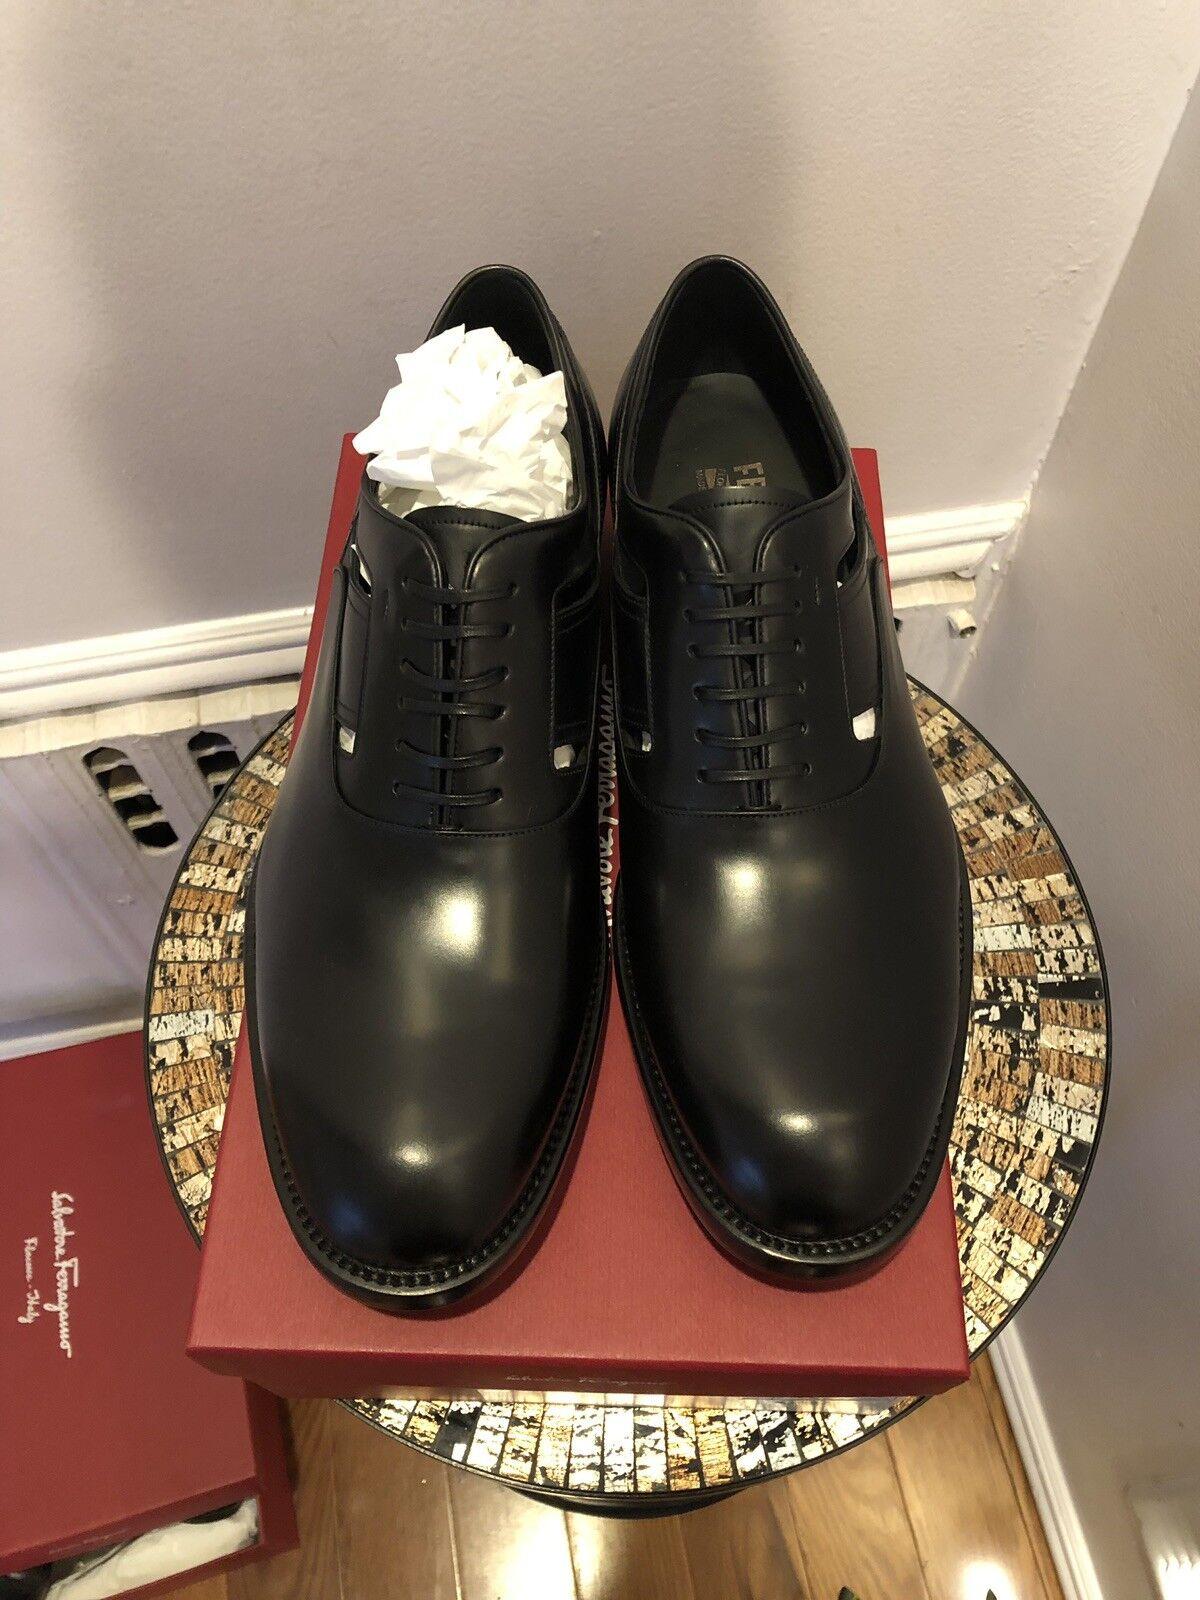 NIB SALVATORE FERRAGAMO Fort Black Leather Mens Oxford Dress shoes shoes shoes 11 EEE 6a95c6